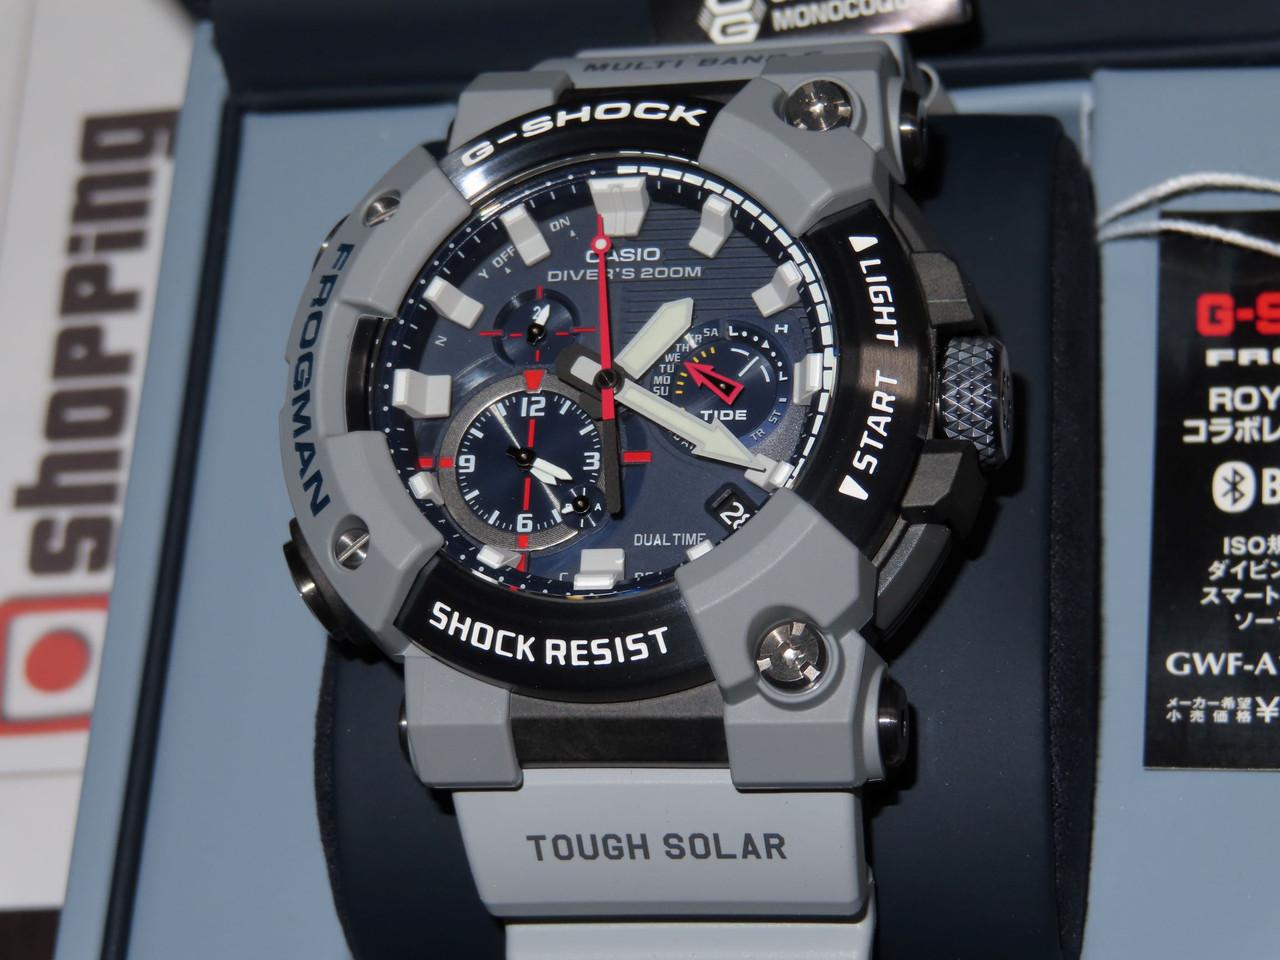 G-Shock Frogman Royal Navy GWF-A1000RN-8AJR